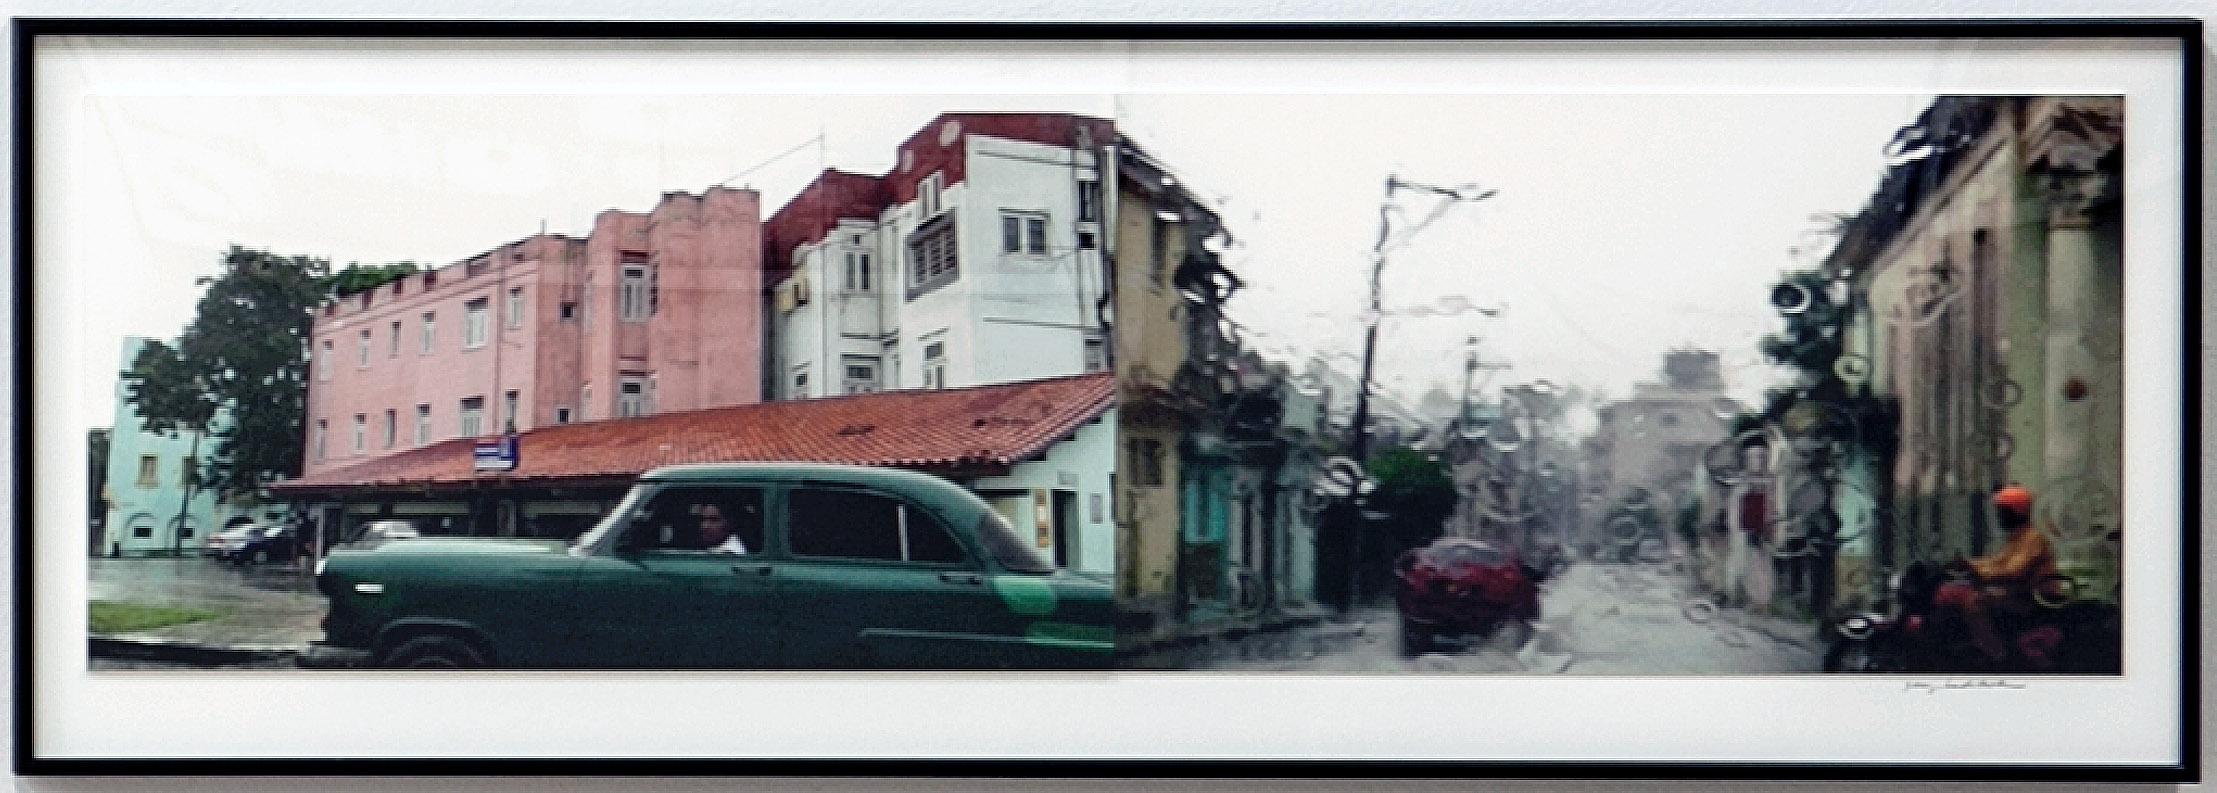 Untitled (Rainy season, Cuba), 2013 (bottom)